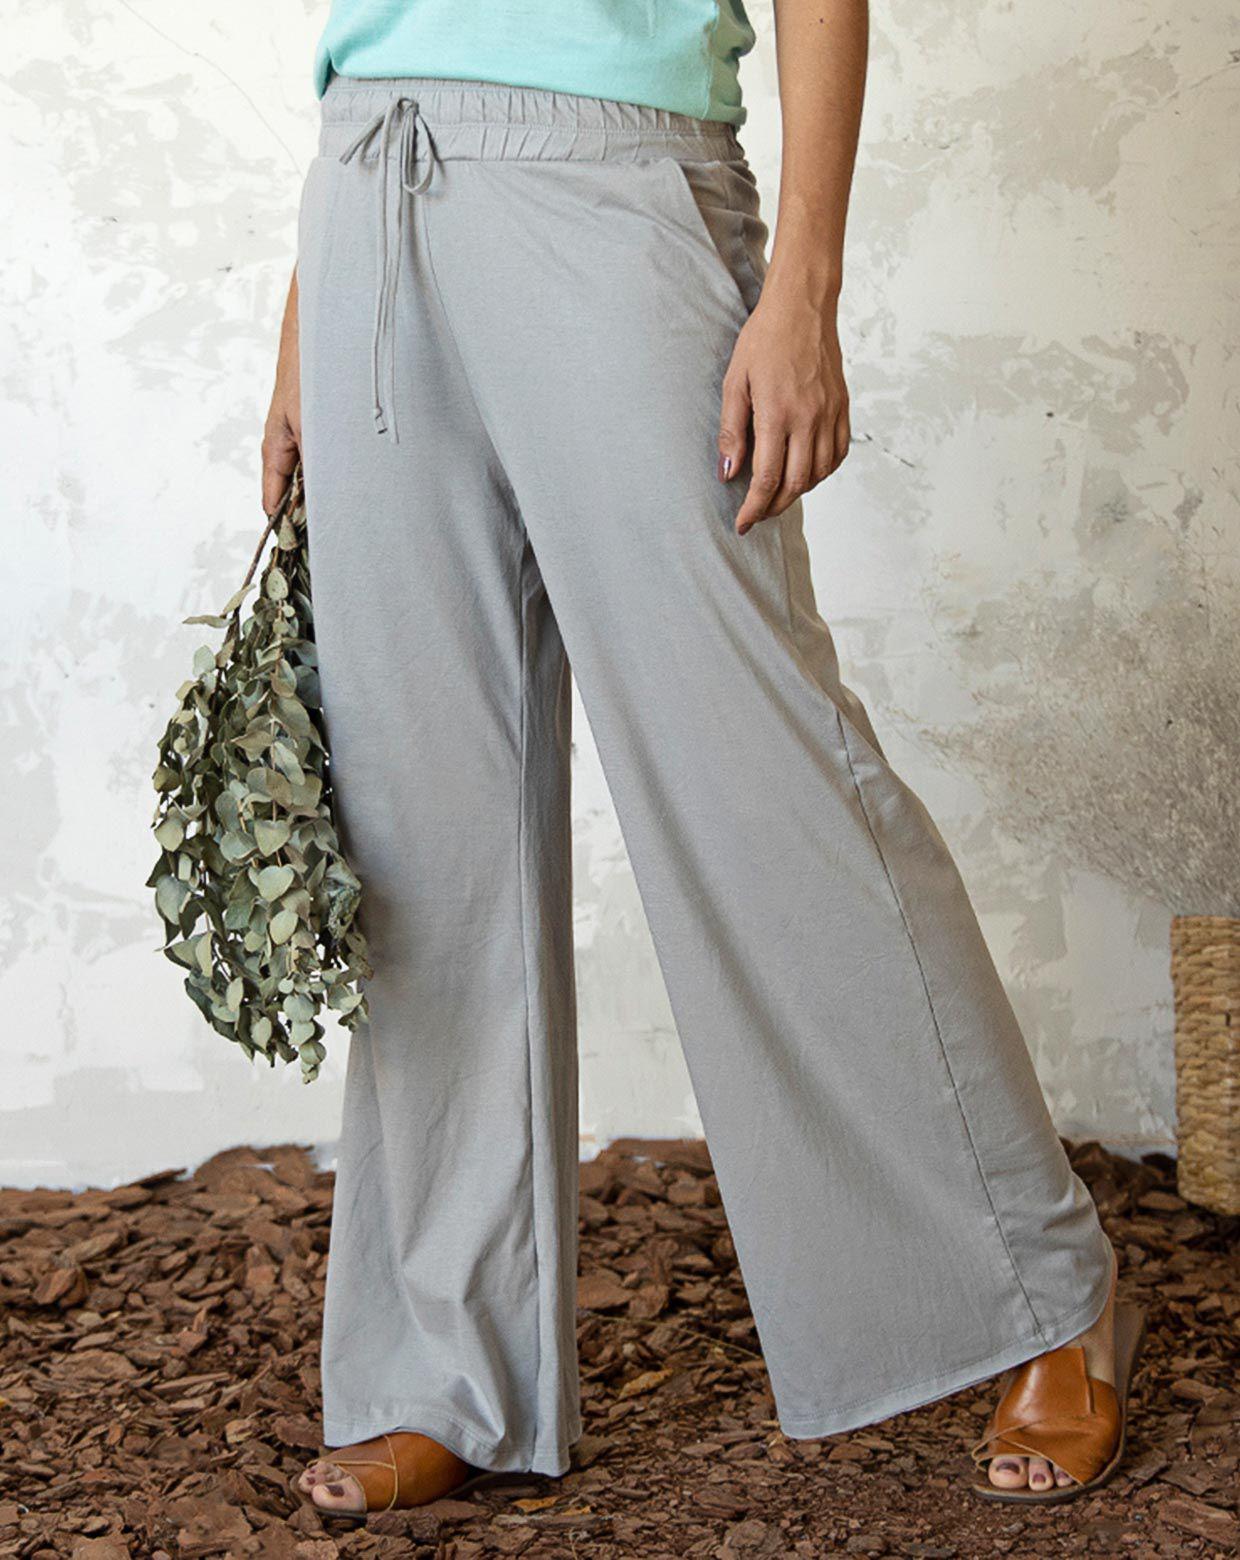 Pantalona Rosa Eco Cinza - Tecido Ecológico